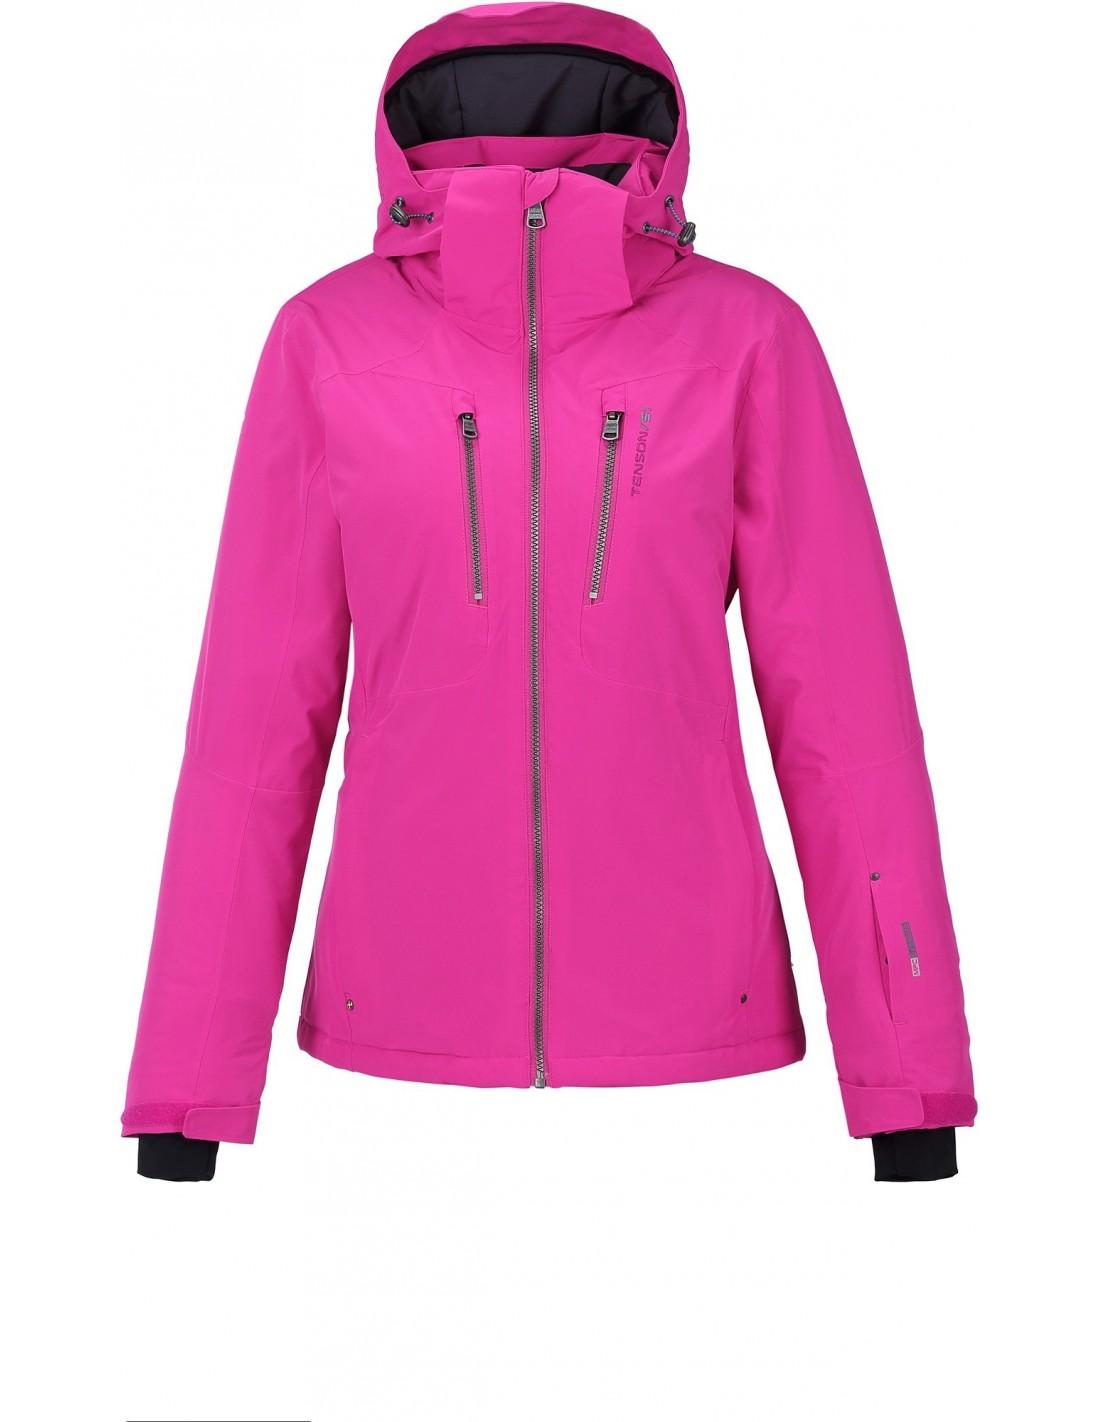 c82e32880771a Kurtka narciarska damska Tenson Yoko, różowa - STSklep